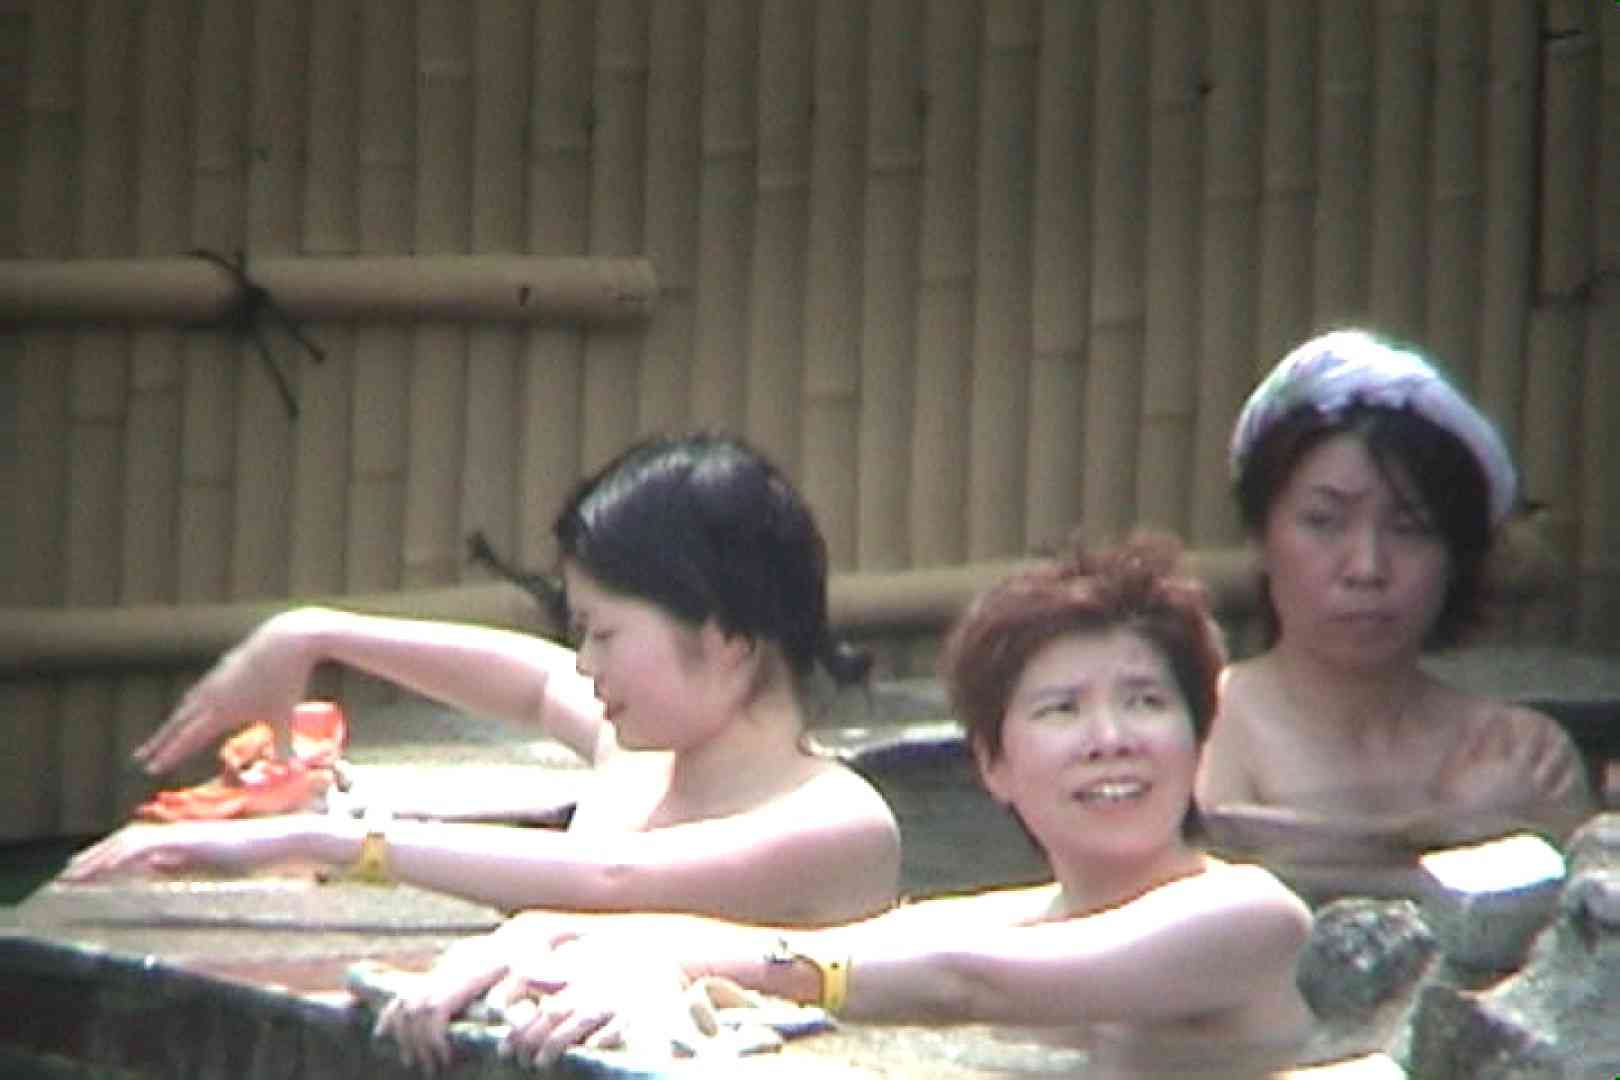 Aquaな露天風呂Vol.54【VIP限定】 露天風呂突入 | 美しいOLの裸体  88pic 49